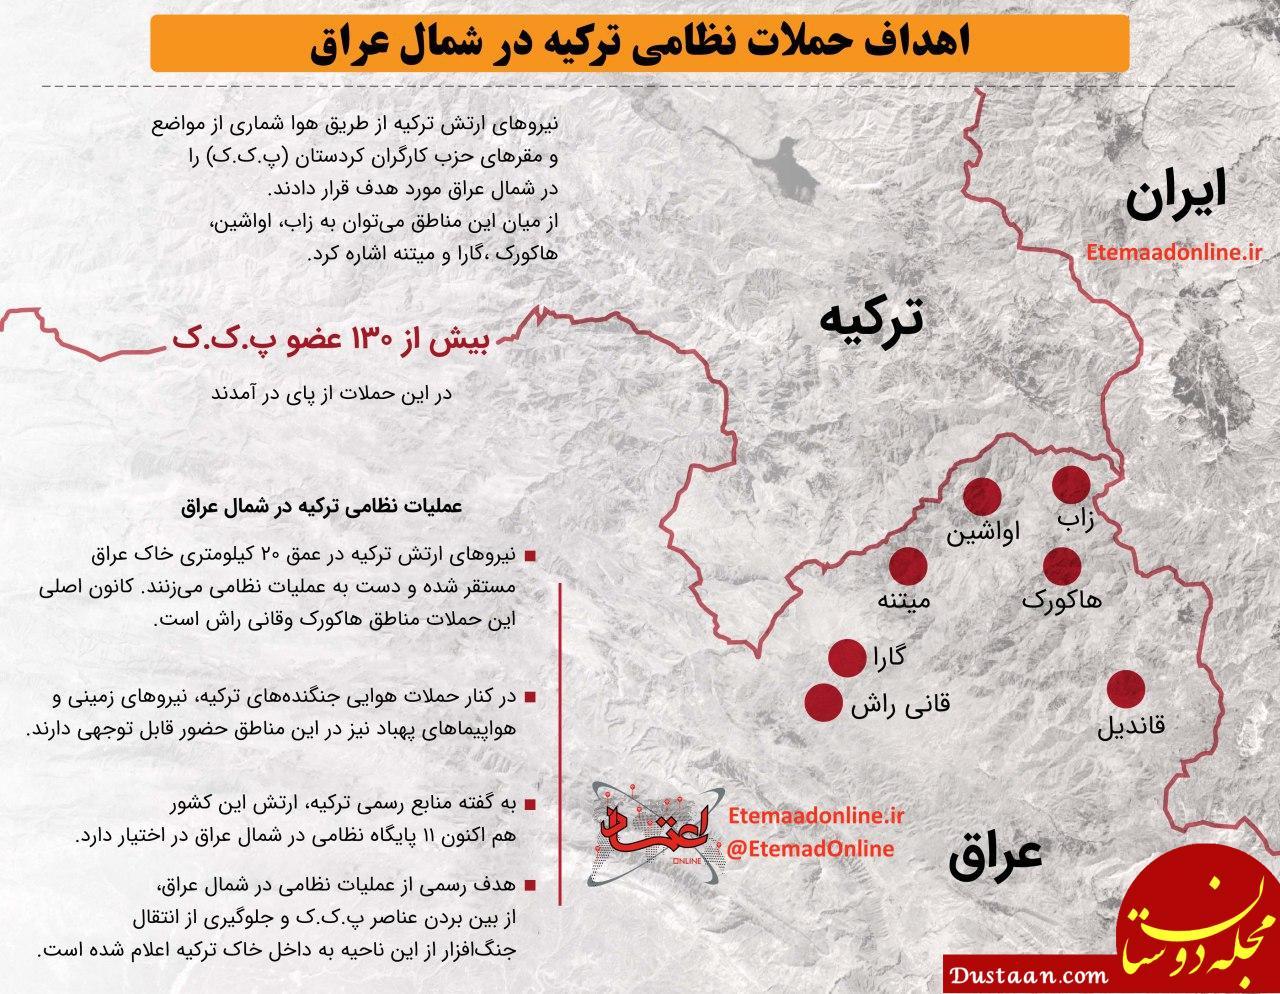 www.dustaan.com اهداف حملات نظامی ترکیه در شمال عراق